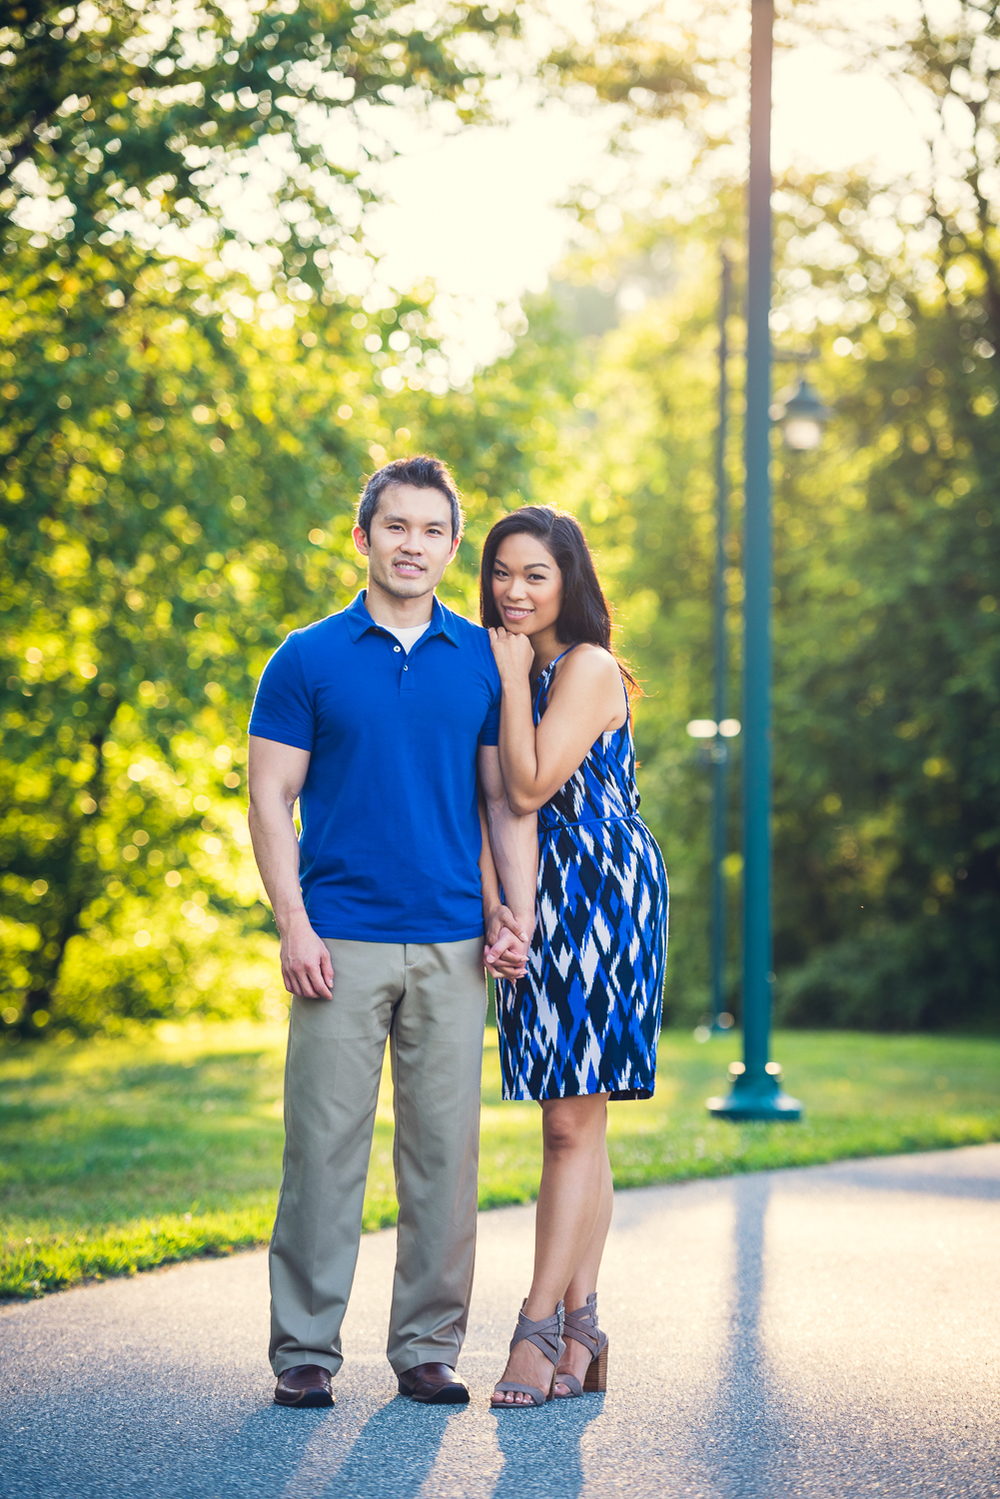 20160705 - Justine Wu Engagement Pix LR-23.jpg